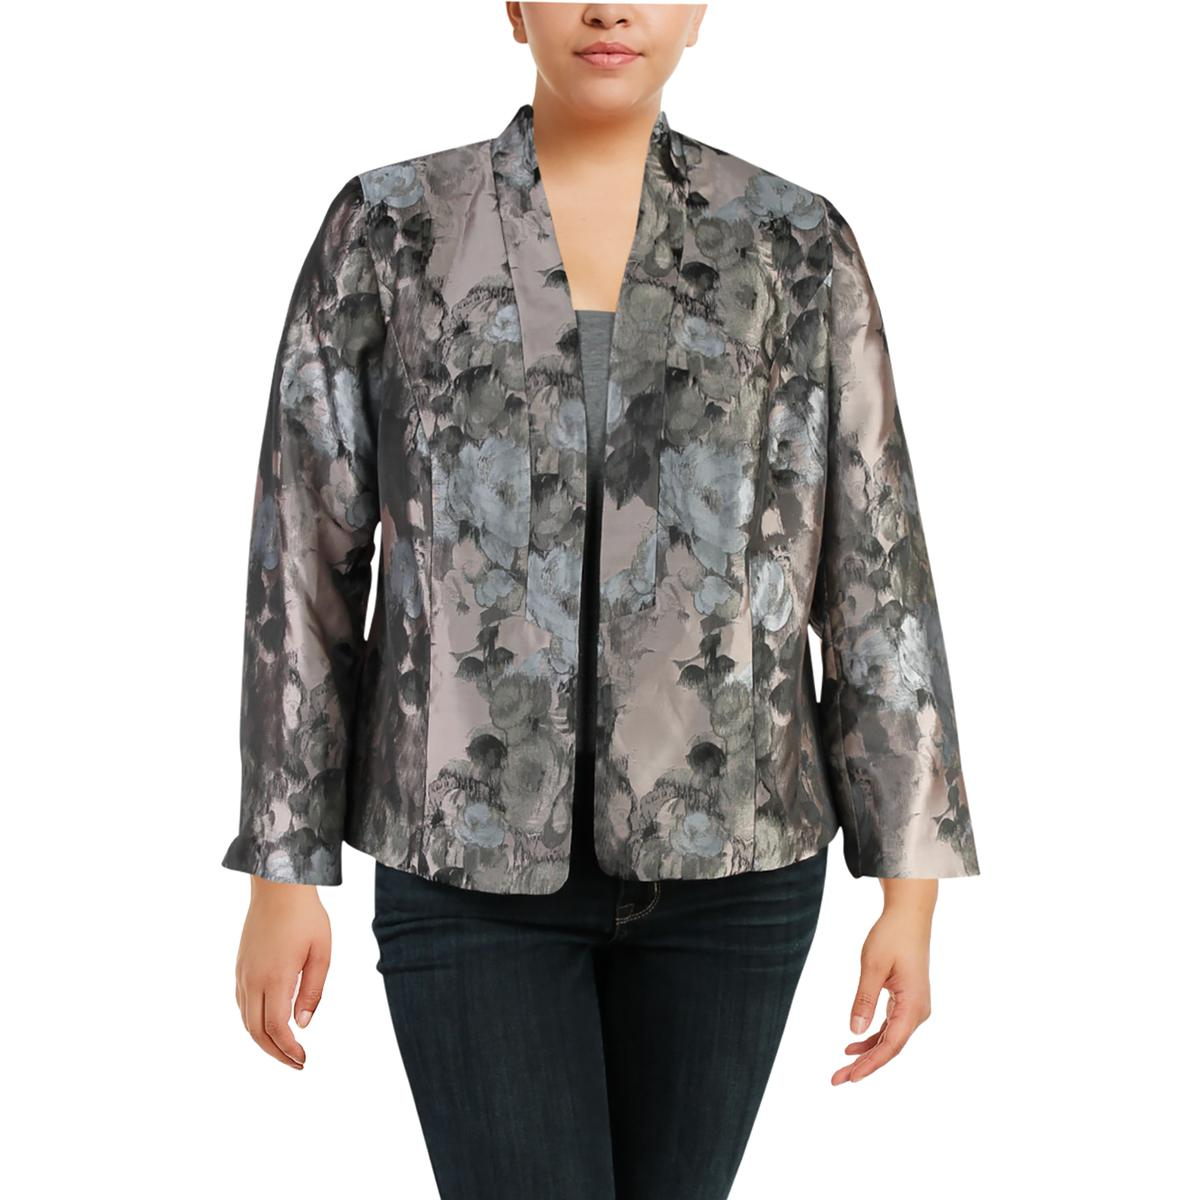 c6732633ce2 Details about Kasper Womens Floral Work Wear Business Open-Front Blazer  Jacket Plus BHFO 2460